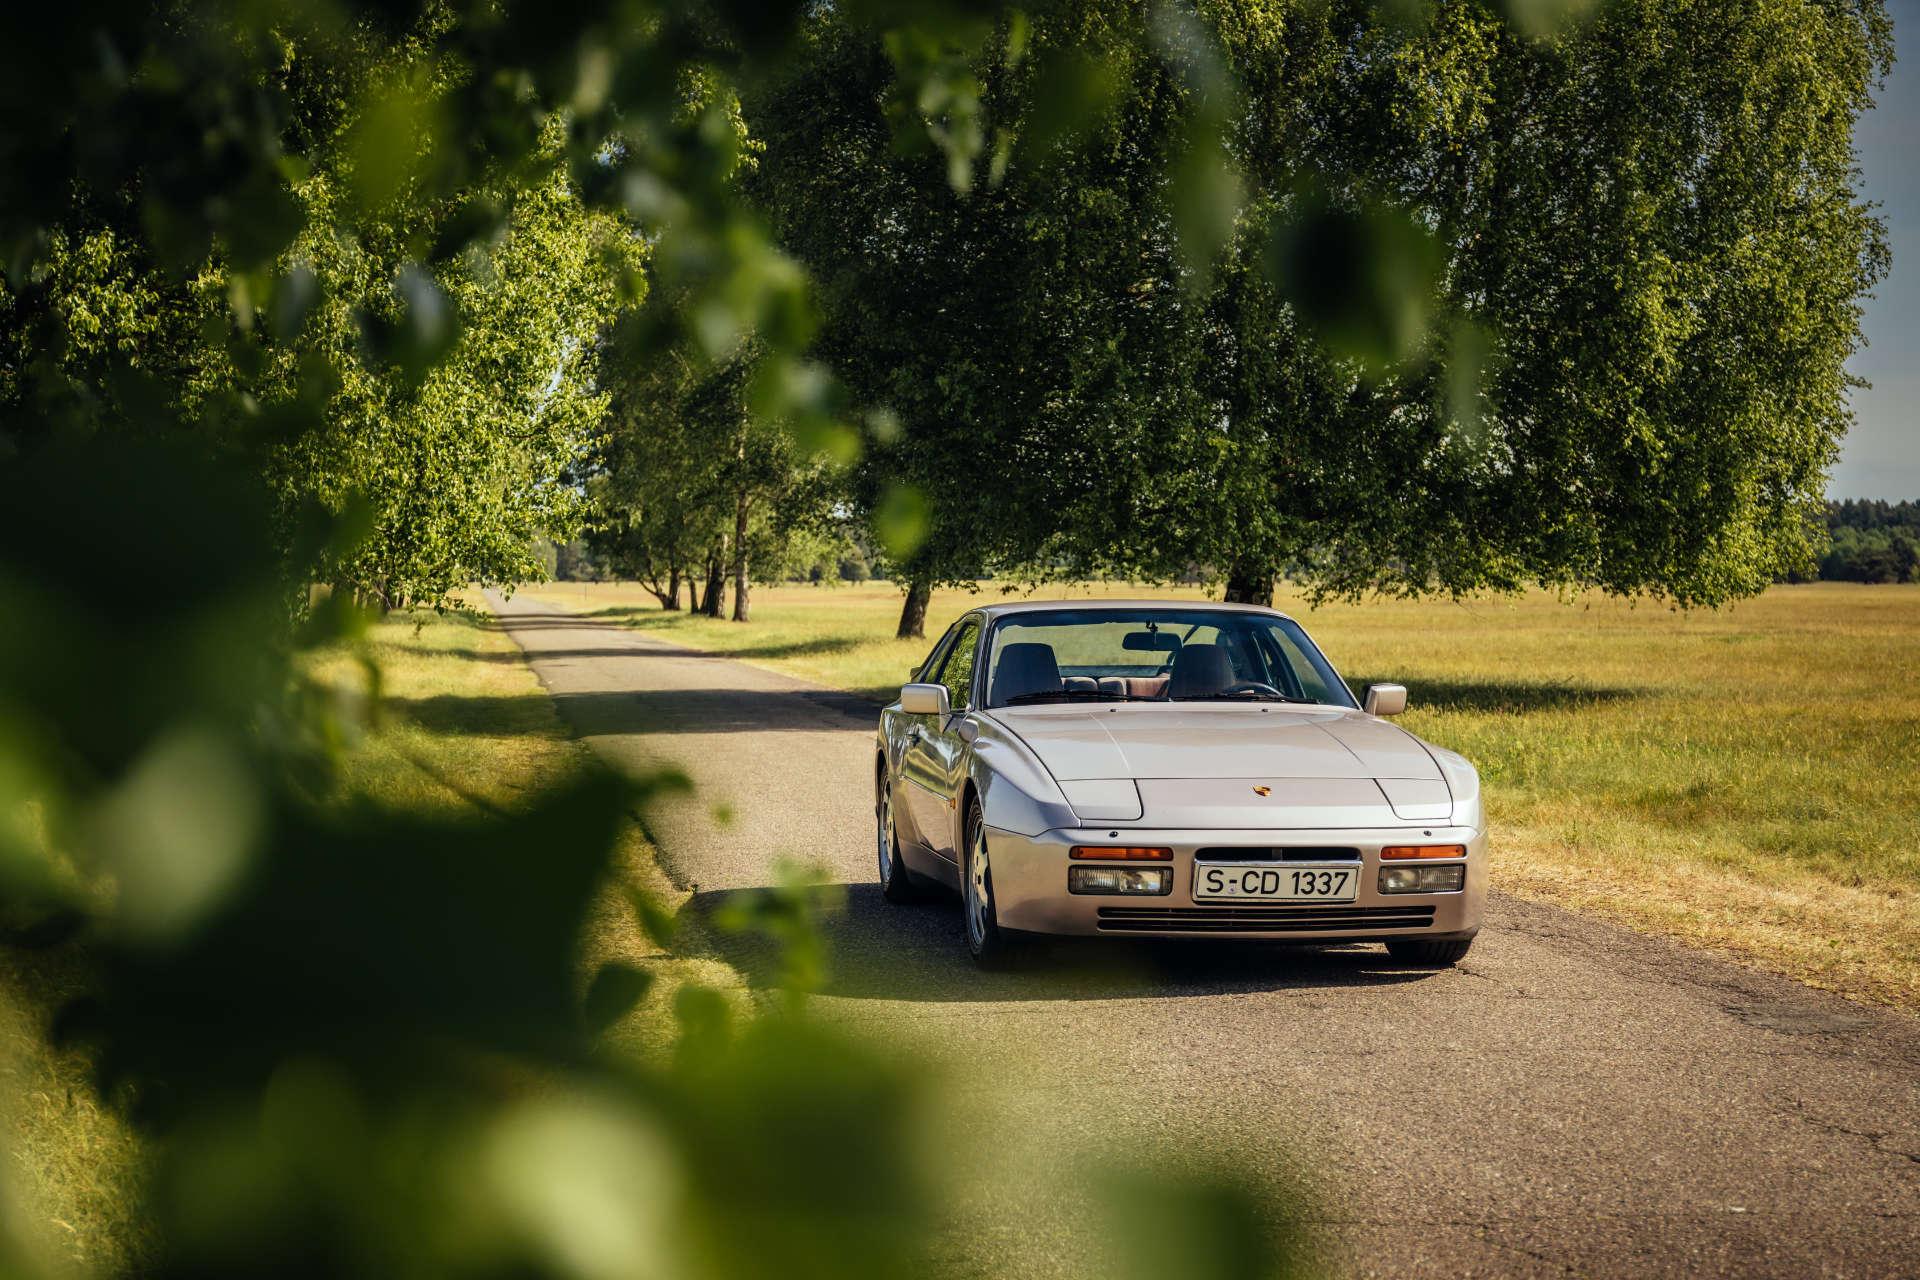 Porsche 944 Turbo S - Front